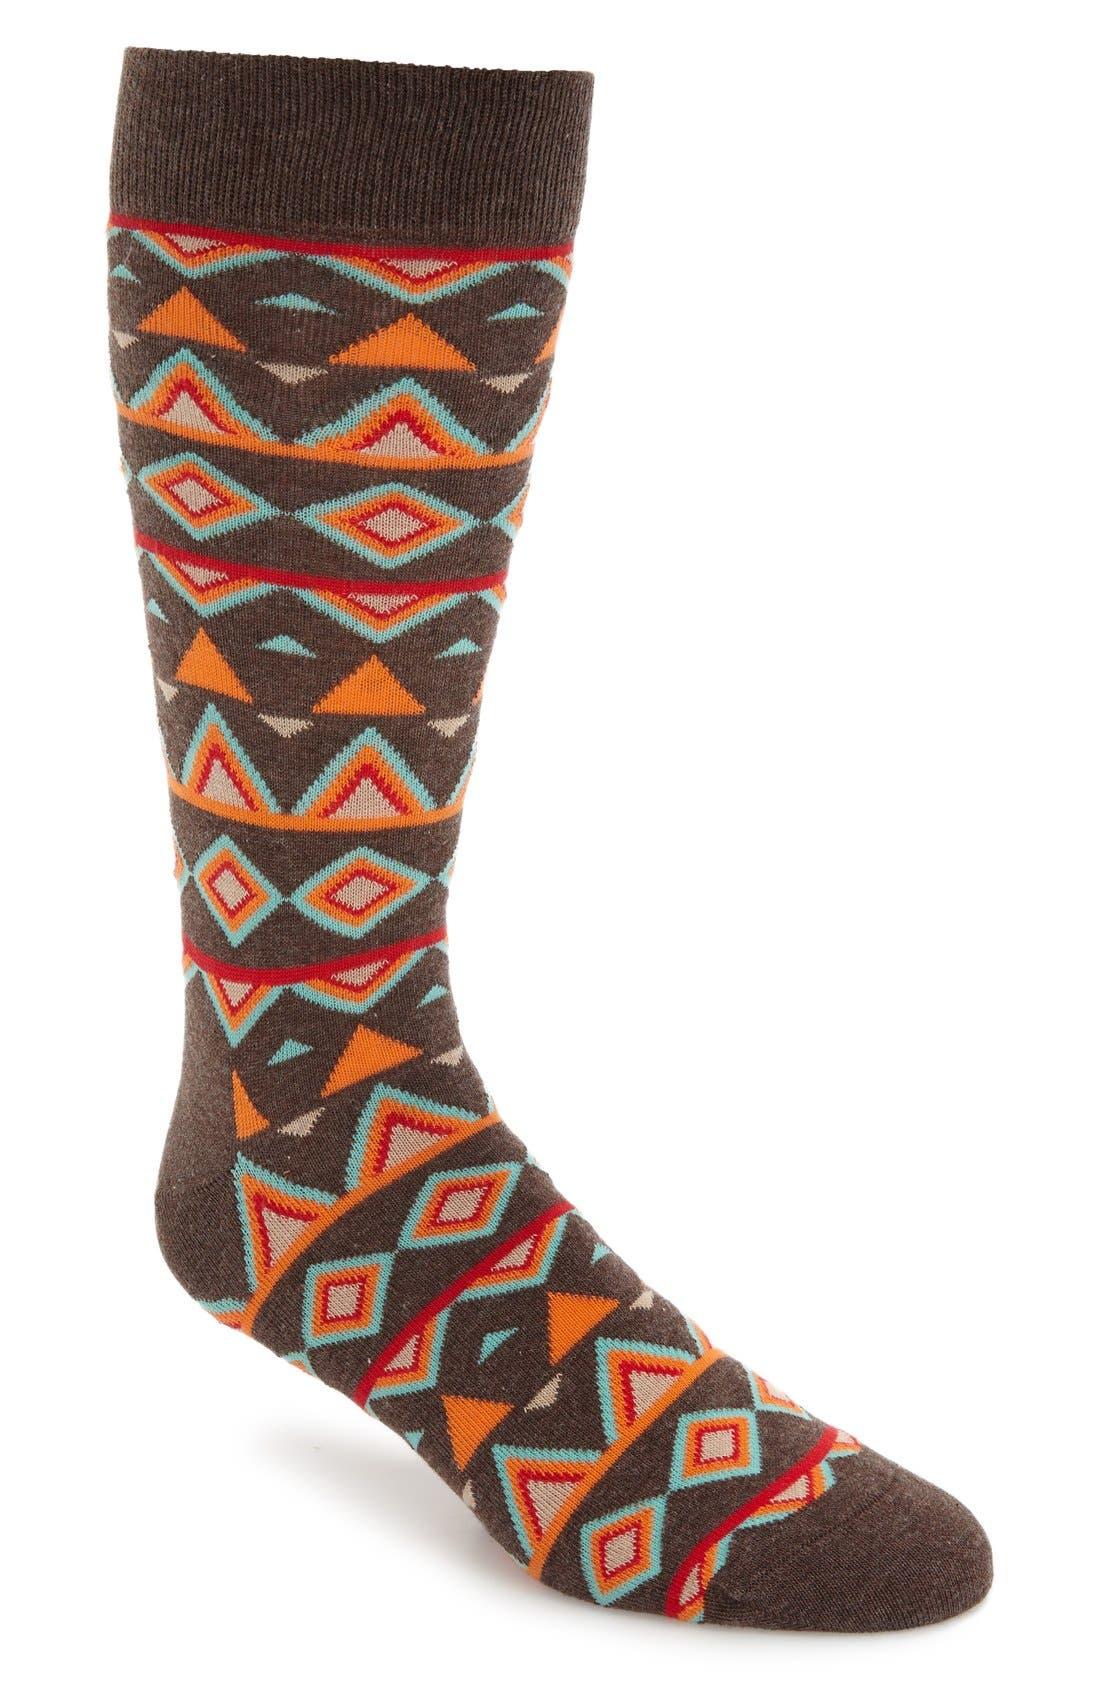 Temple Cotton Blend Socks,                             Main thumbnail 1, color,                             017